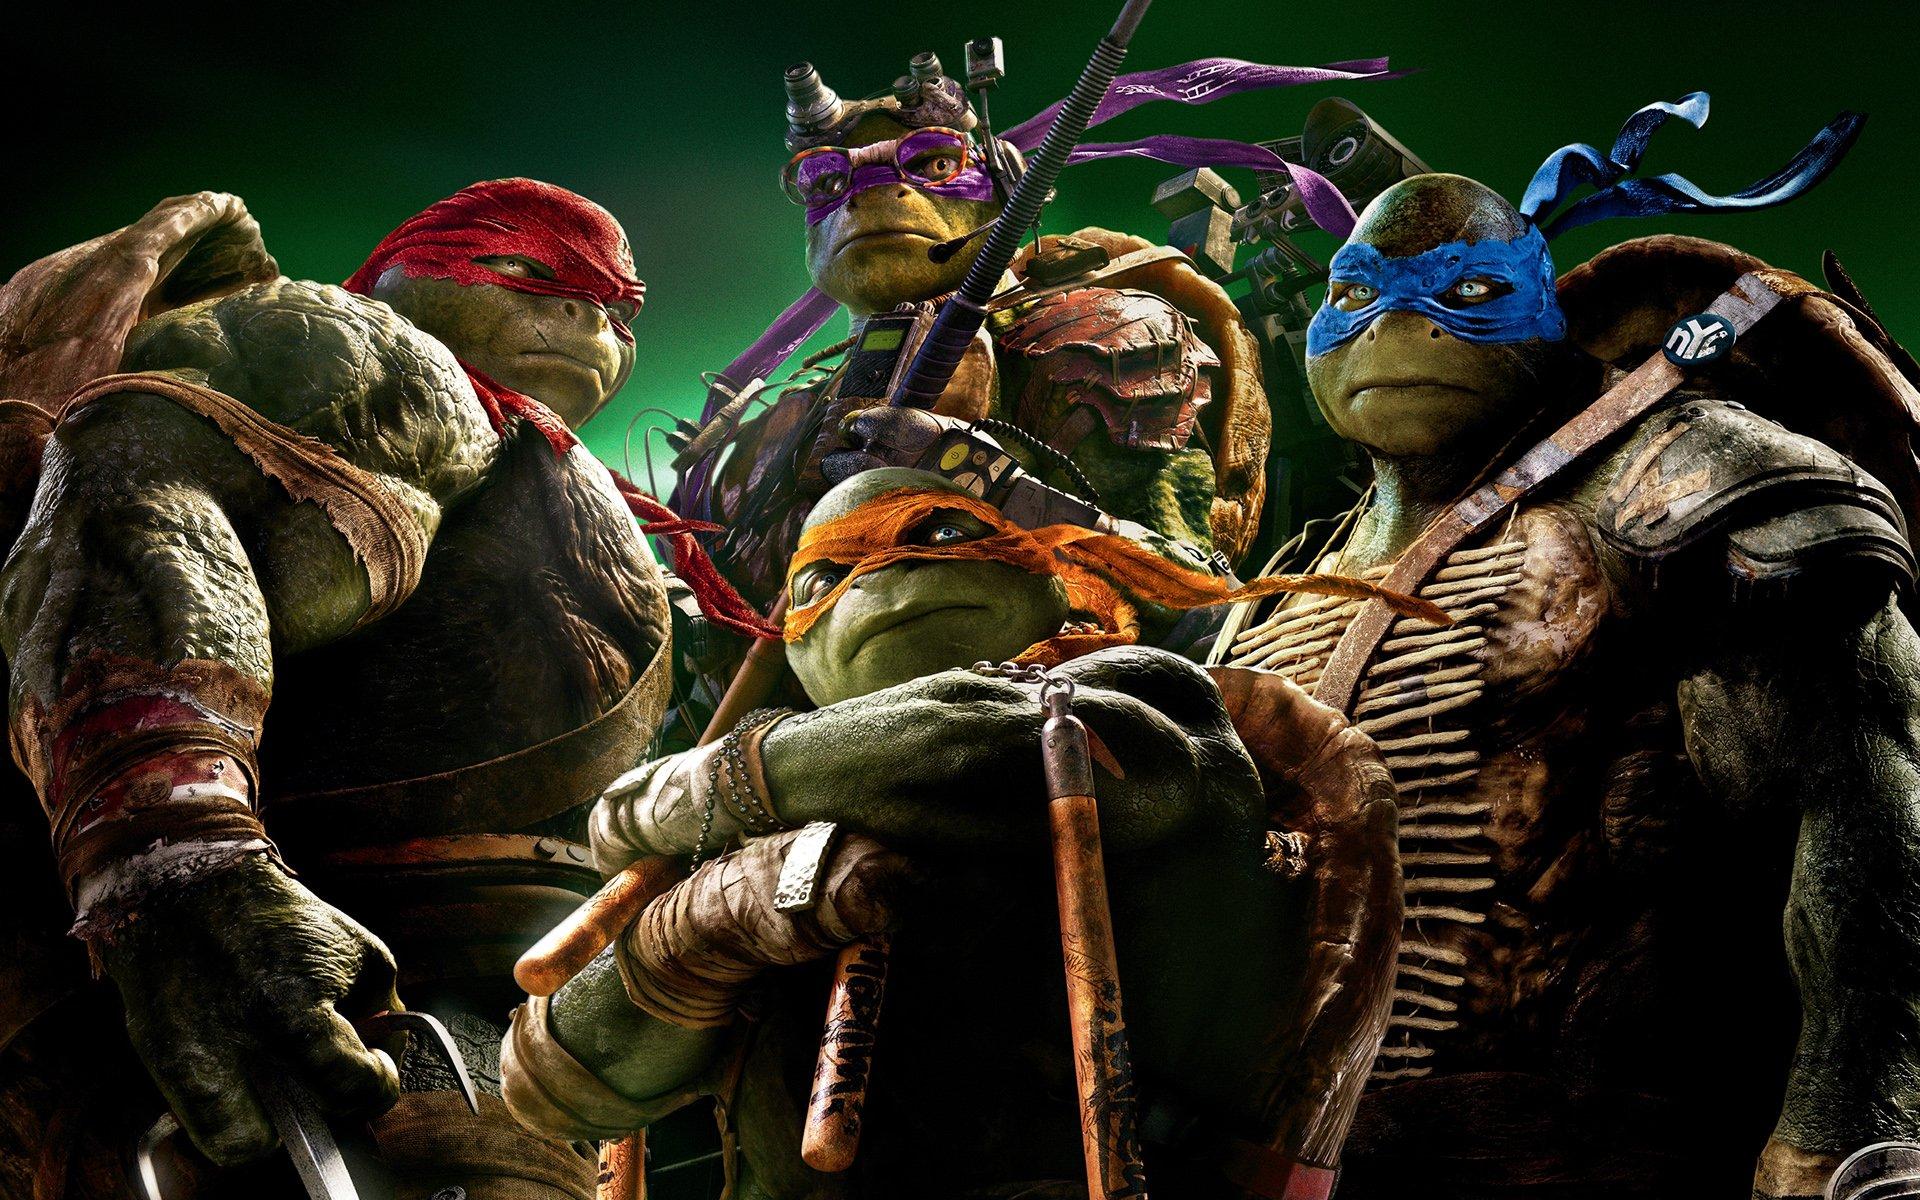 65 Teenage Mutant Ninja Turtles 2014 Hd Wallpapers Background